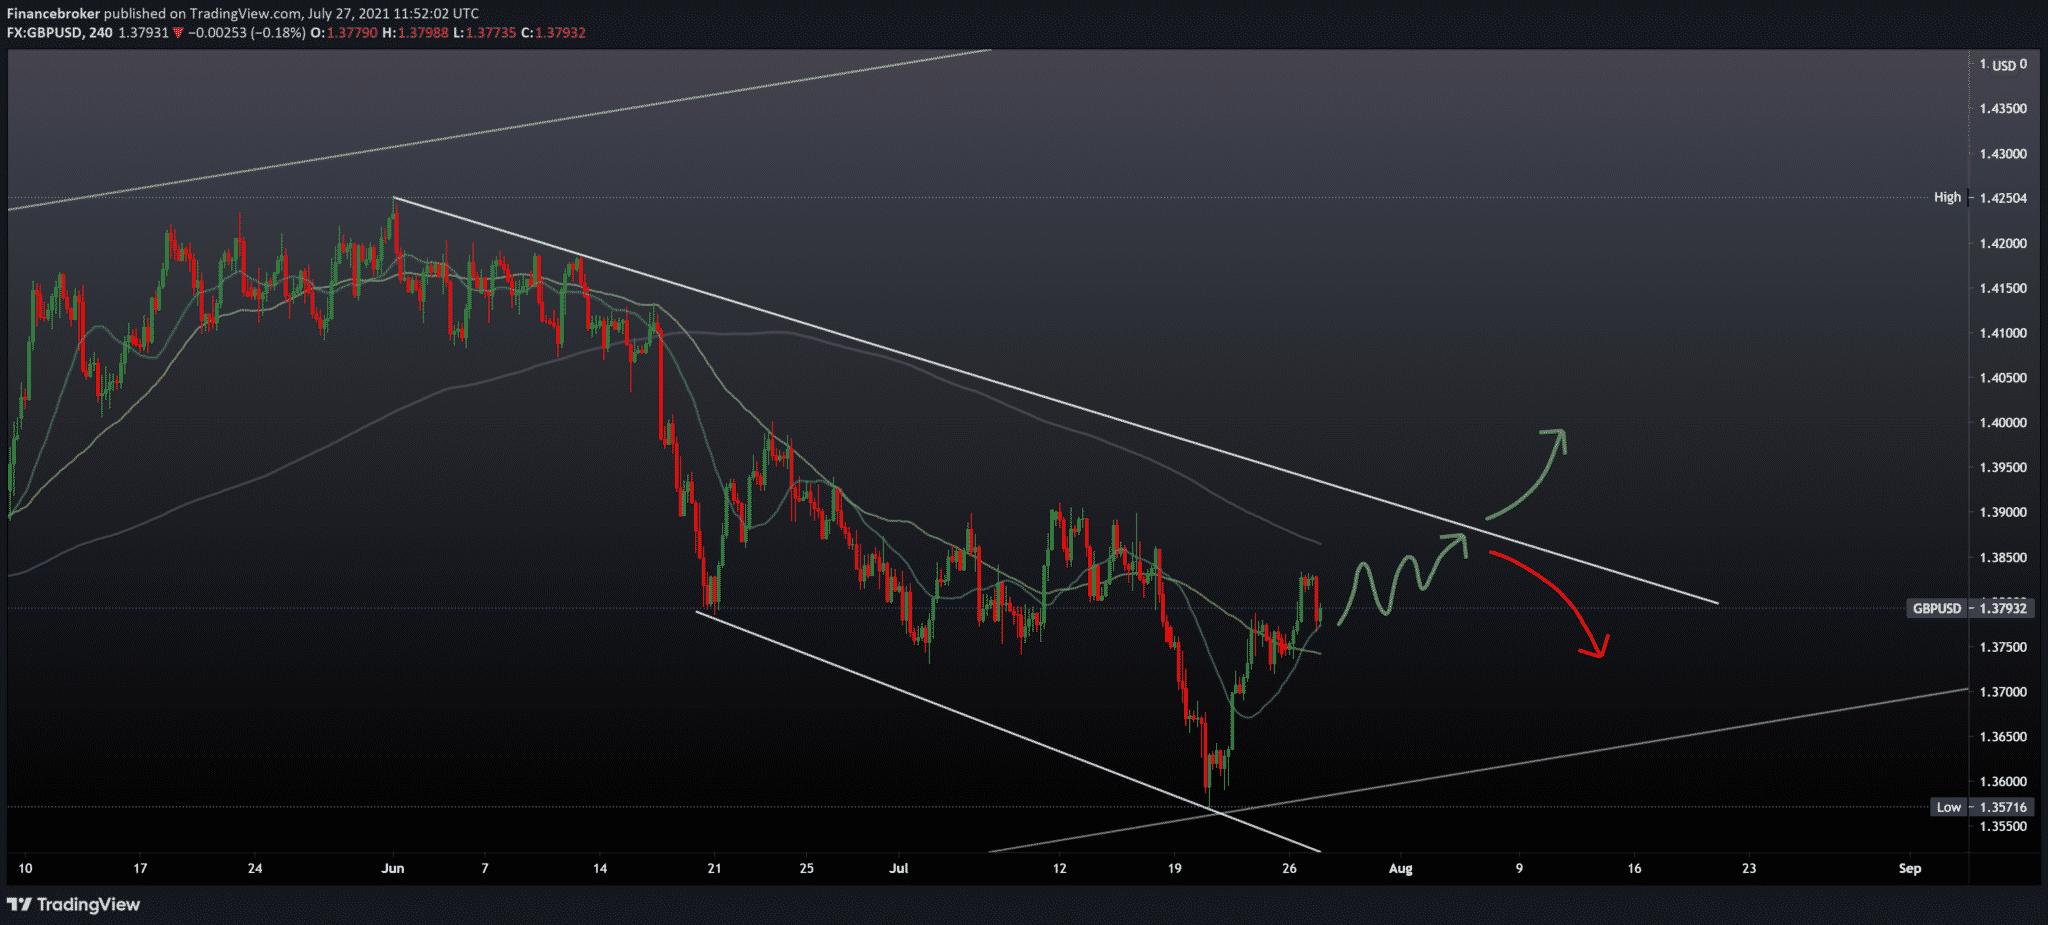 EURUSD, GBPUSD waiting for the FOMC meeting